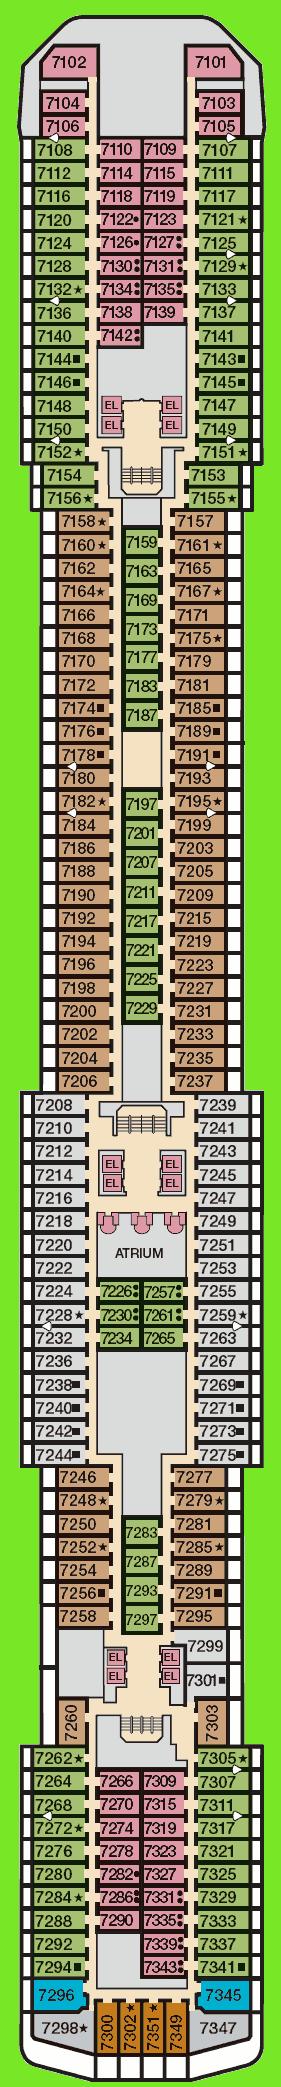 Verandah Deck